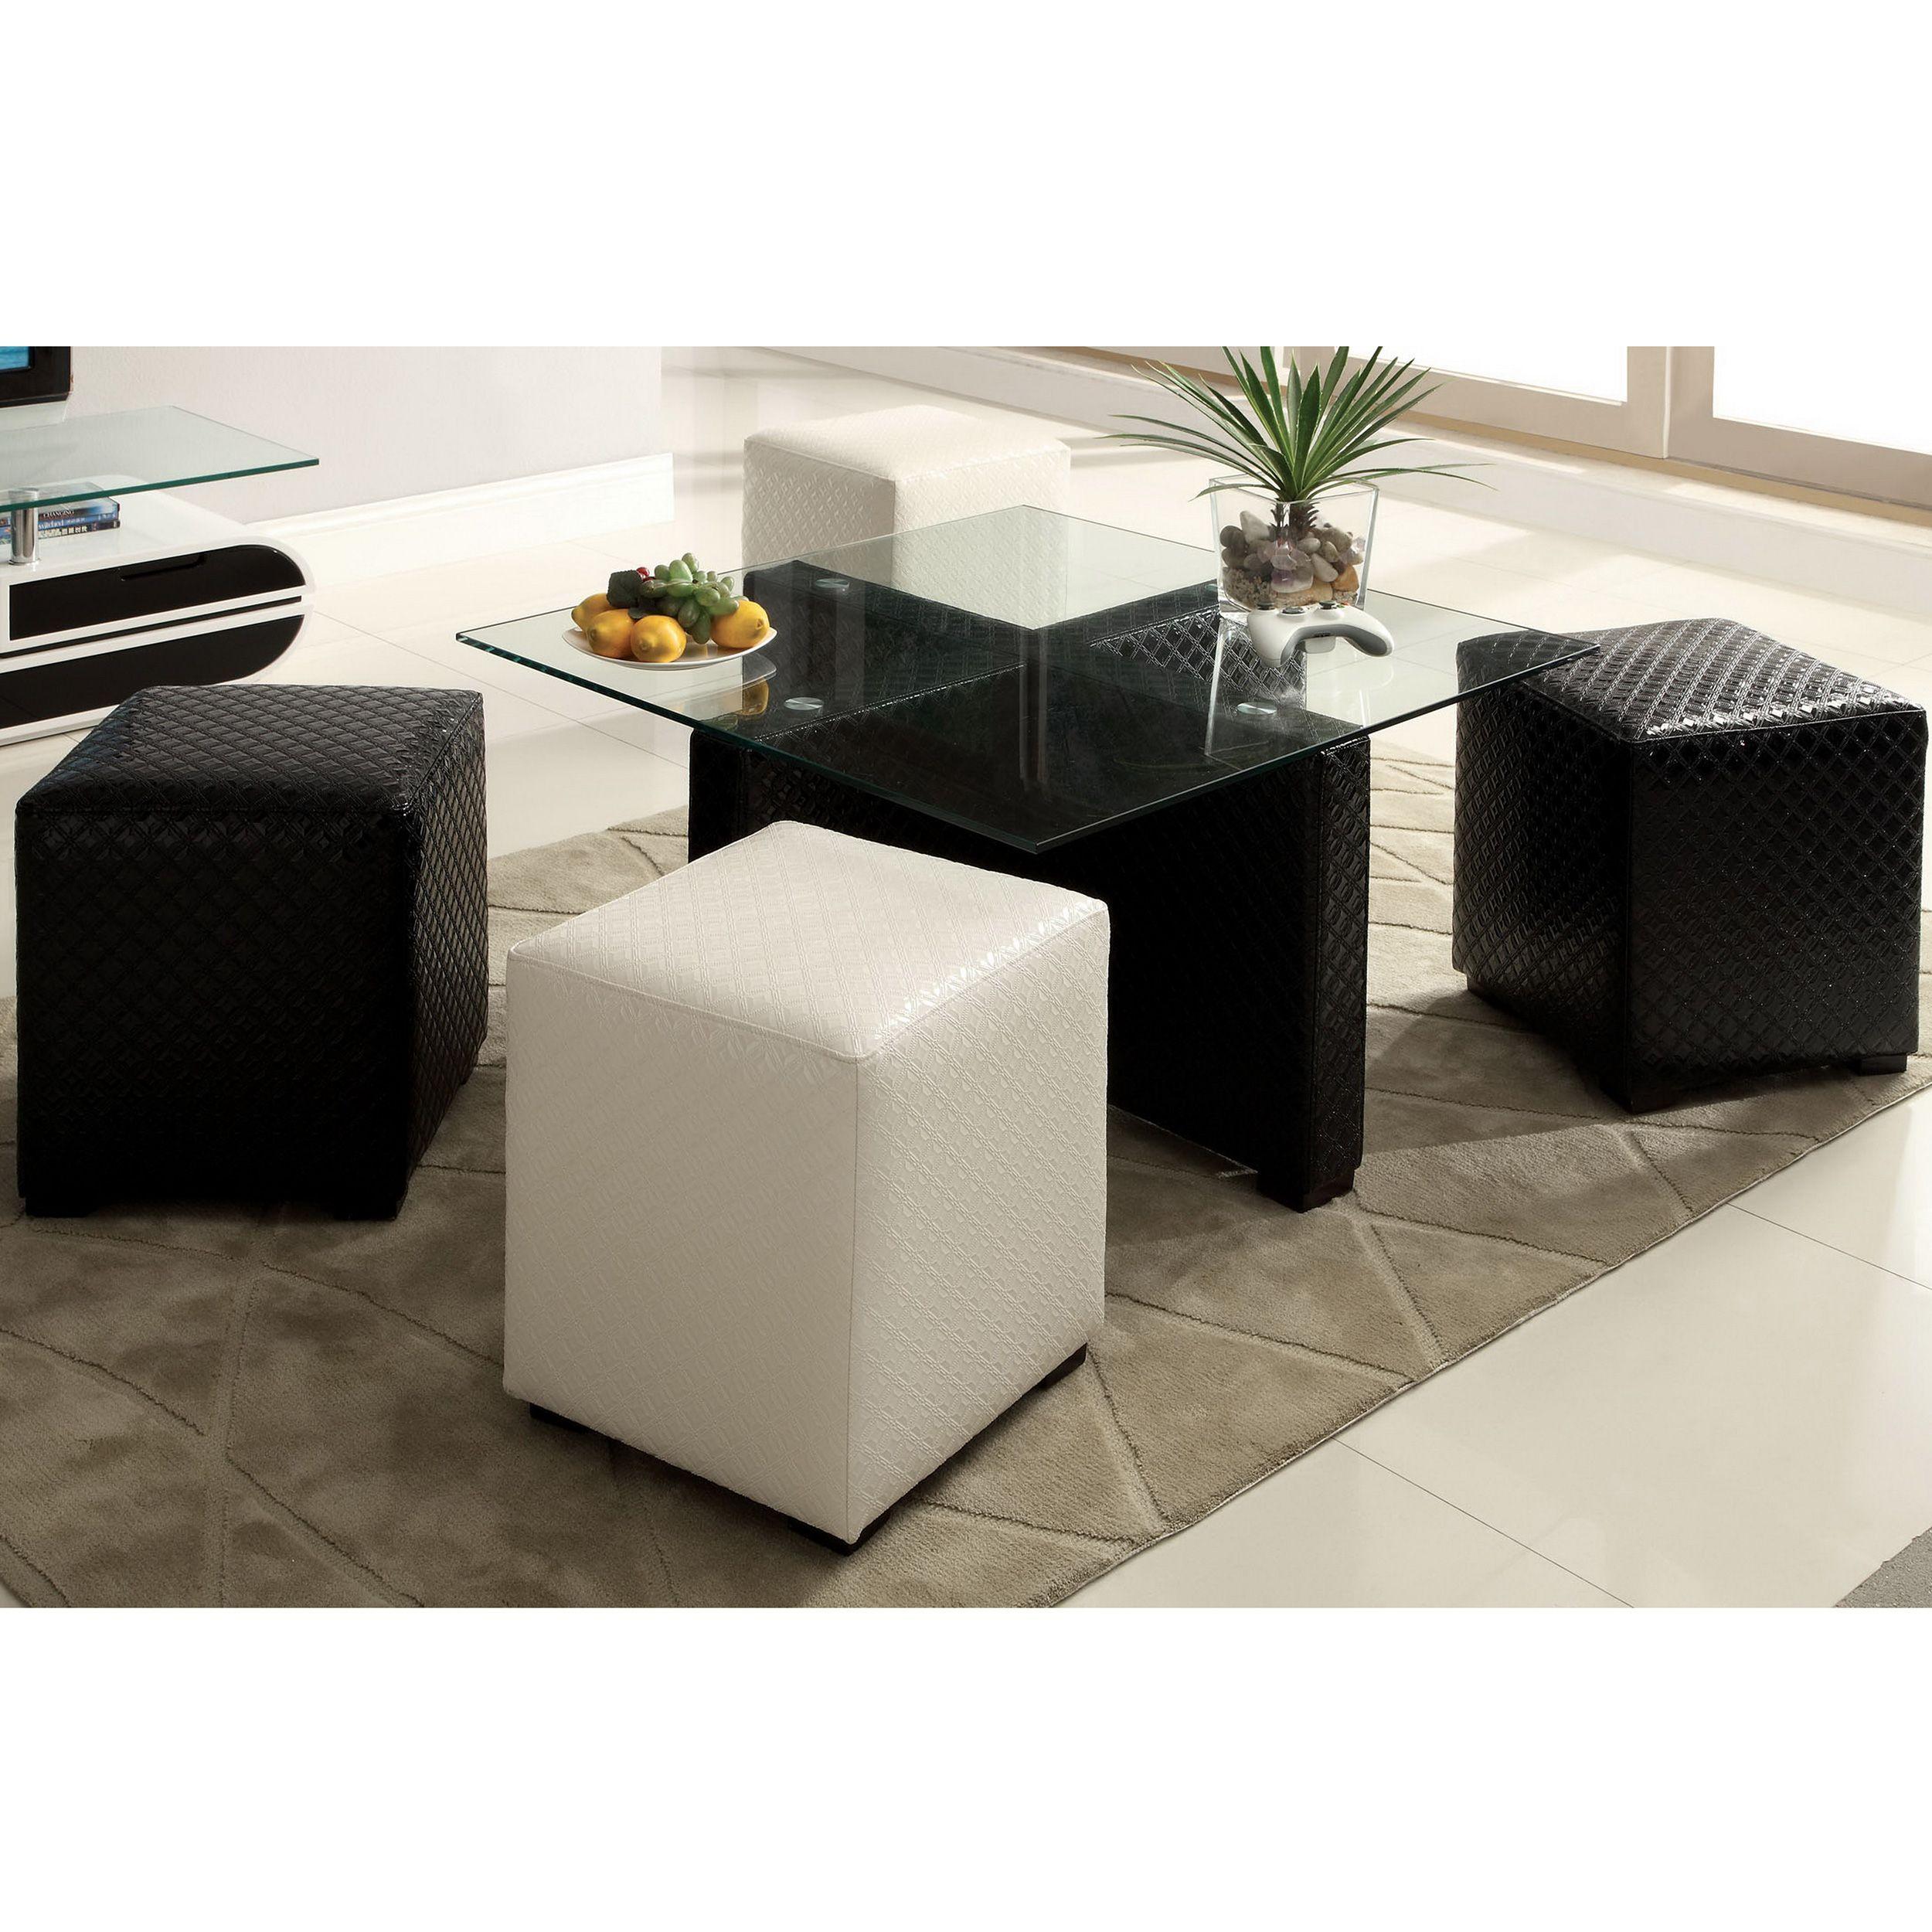 Furniture of America Mitch Contemporary 2-tone 8 mm Glass 4-Ottoman ...